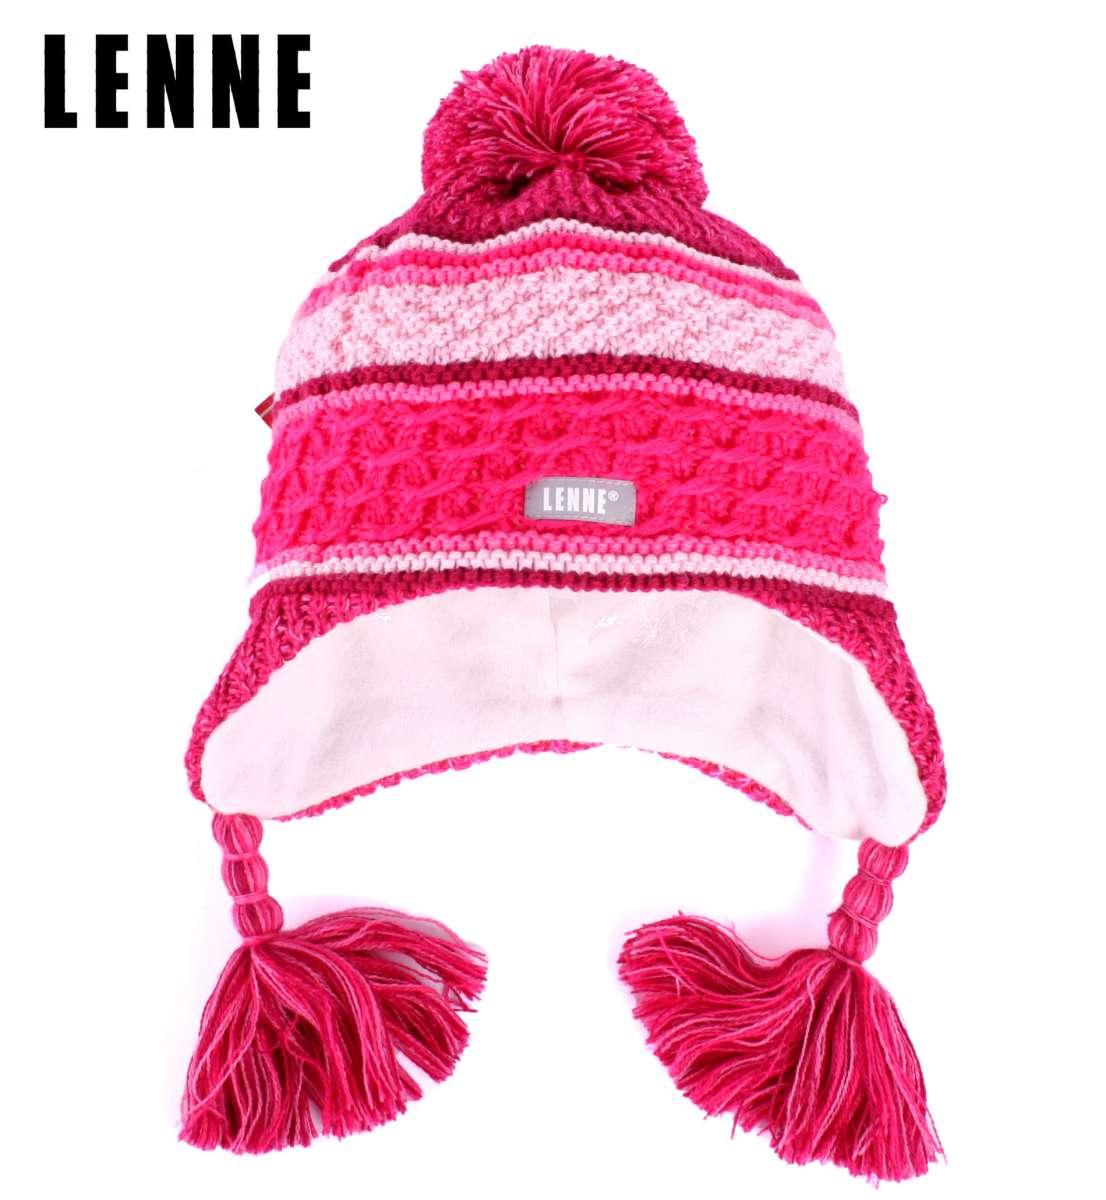 Lenne Knitted Hat Pauly Mazuļu siltā ziemas cepure